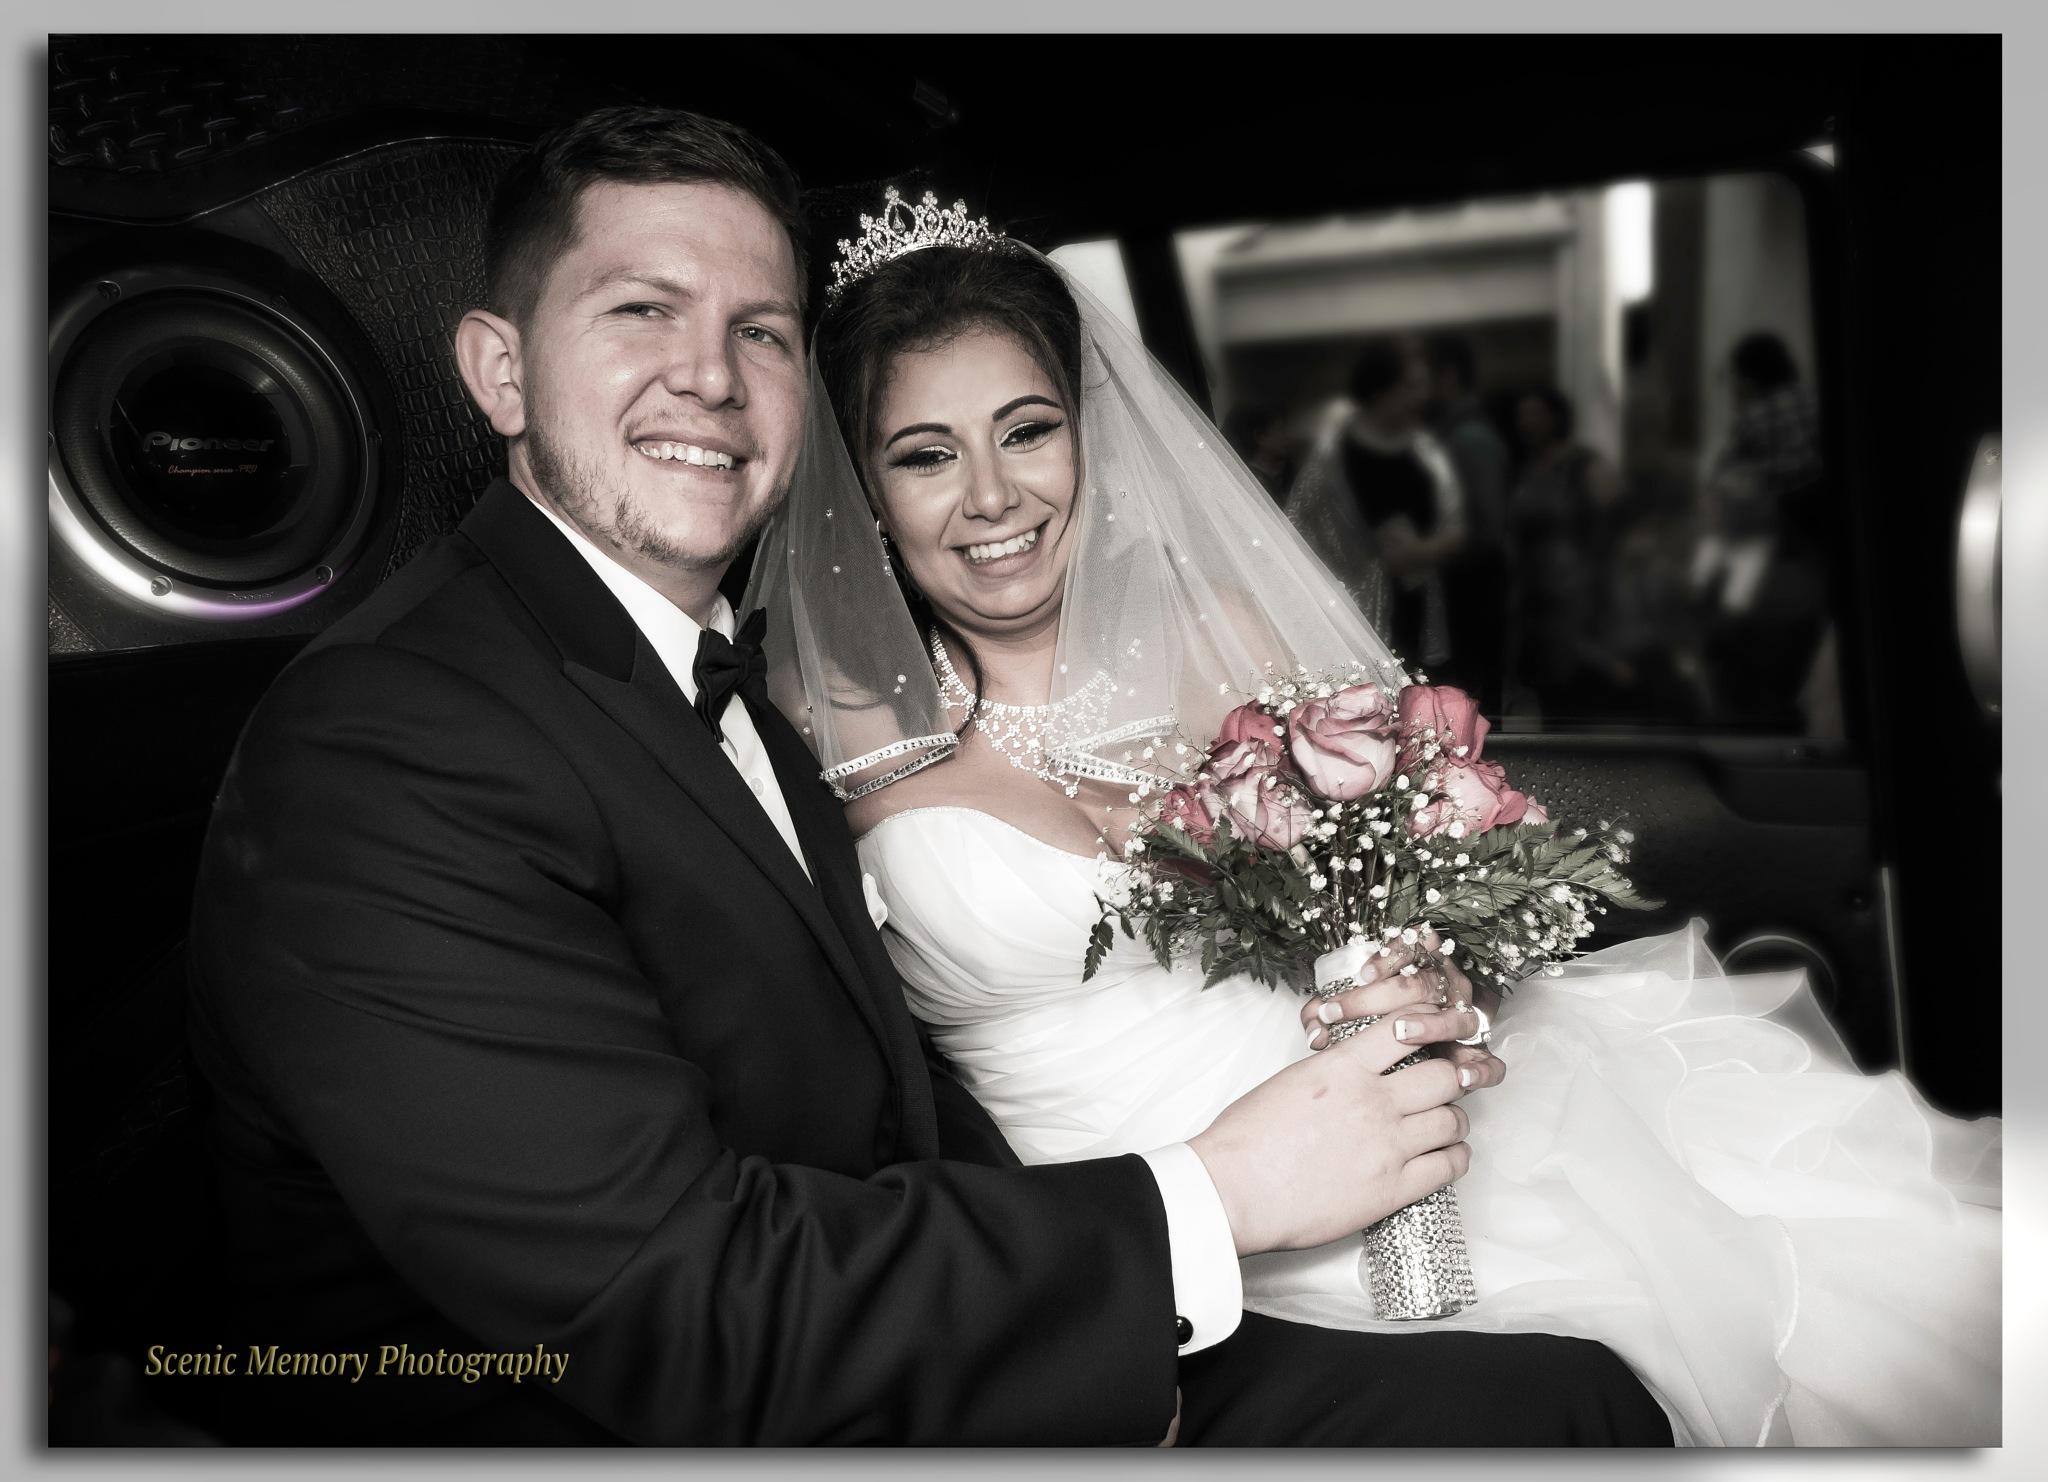 Mary's Wedding Drive to Recep by albair.hanna.9